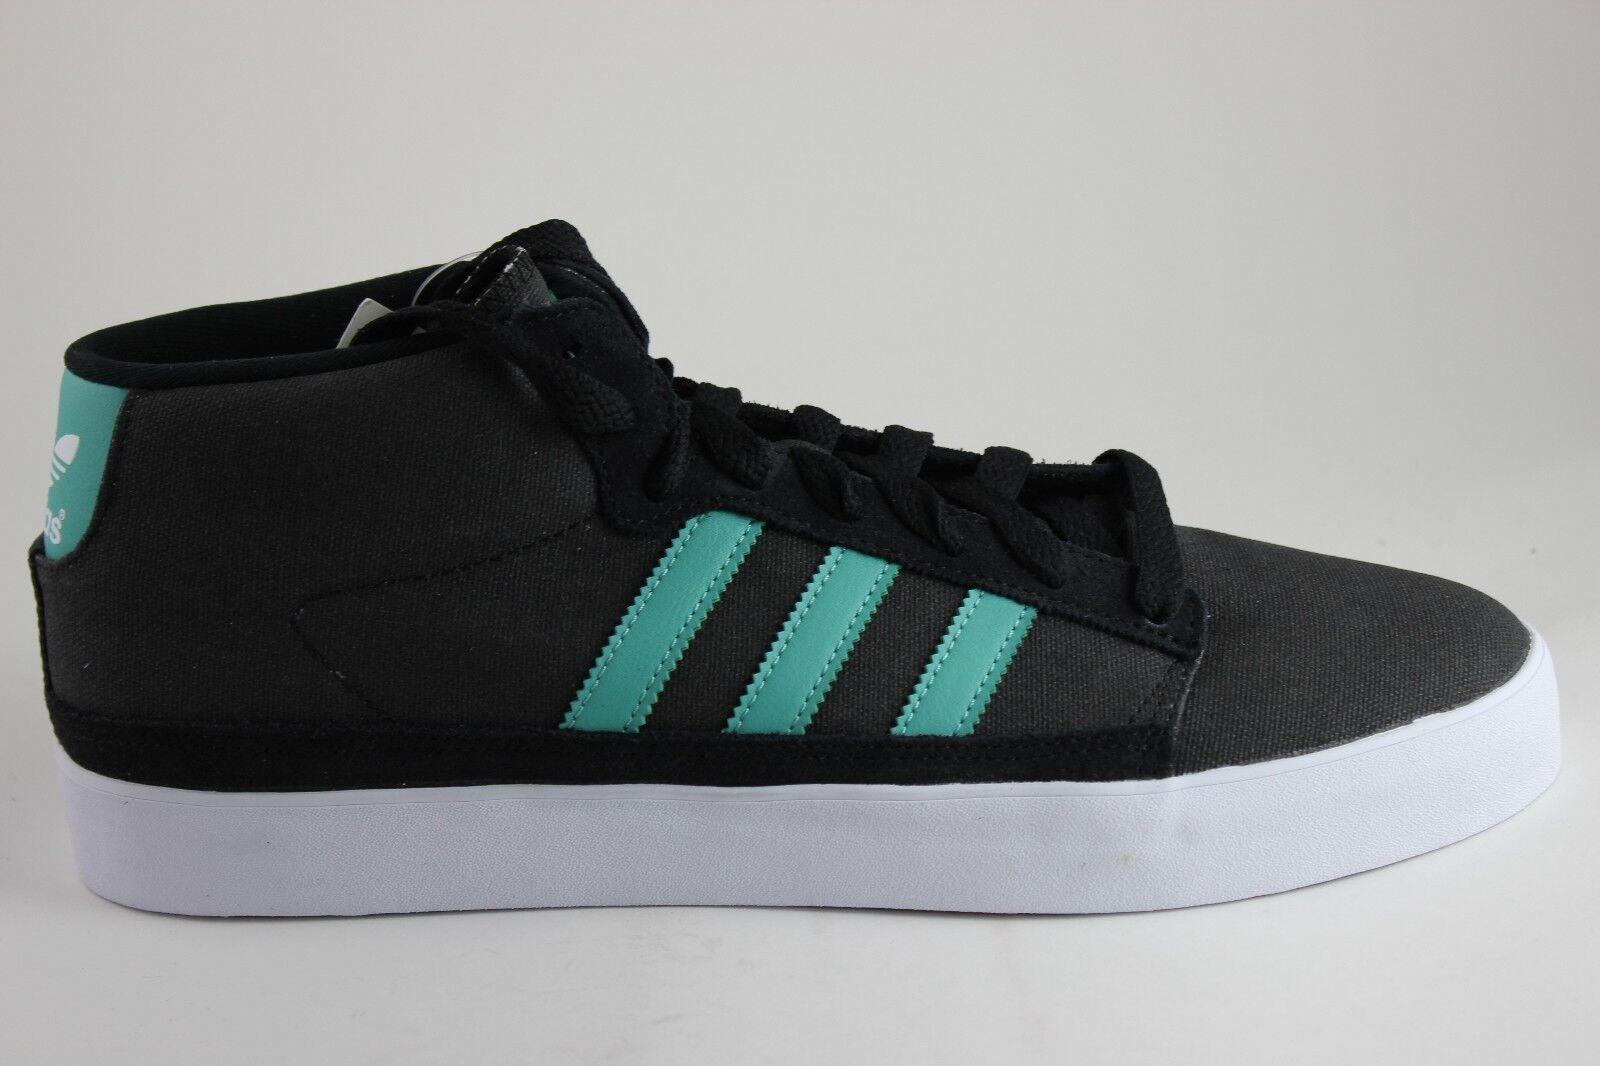 Men's Adidas Rayado Mid Skateboarding G99791 Black NIB Comfortable and good-looking